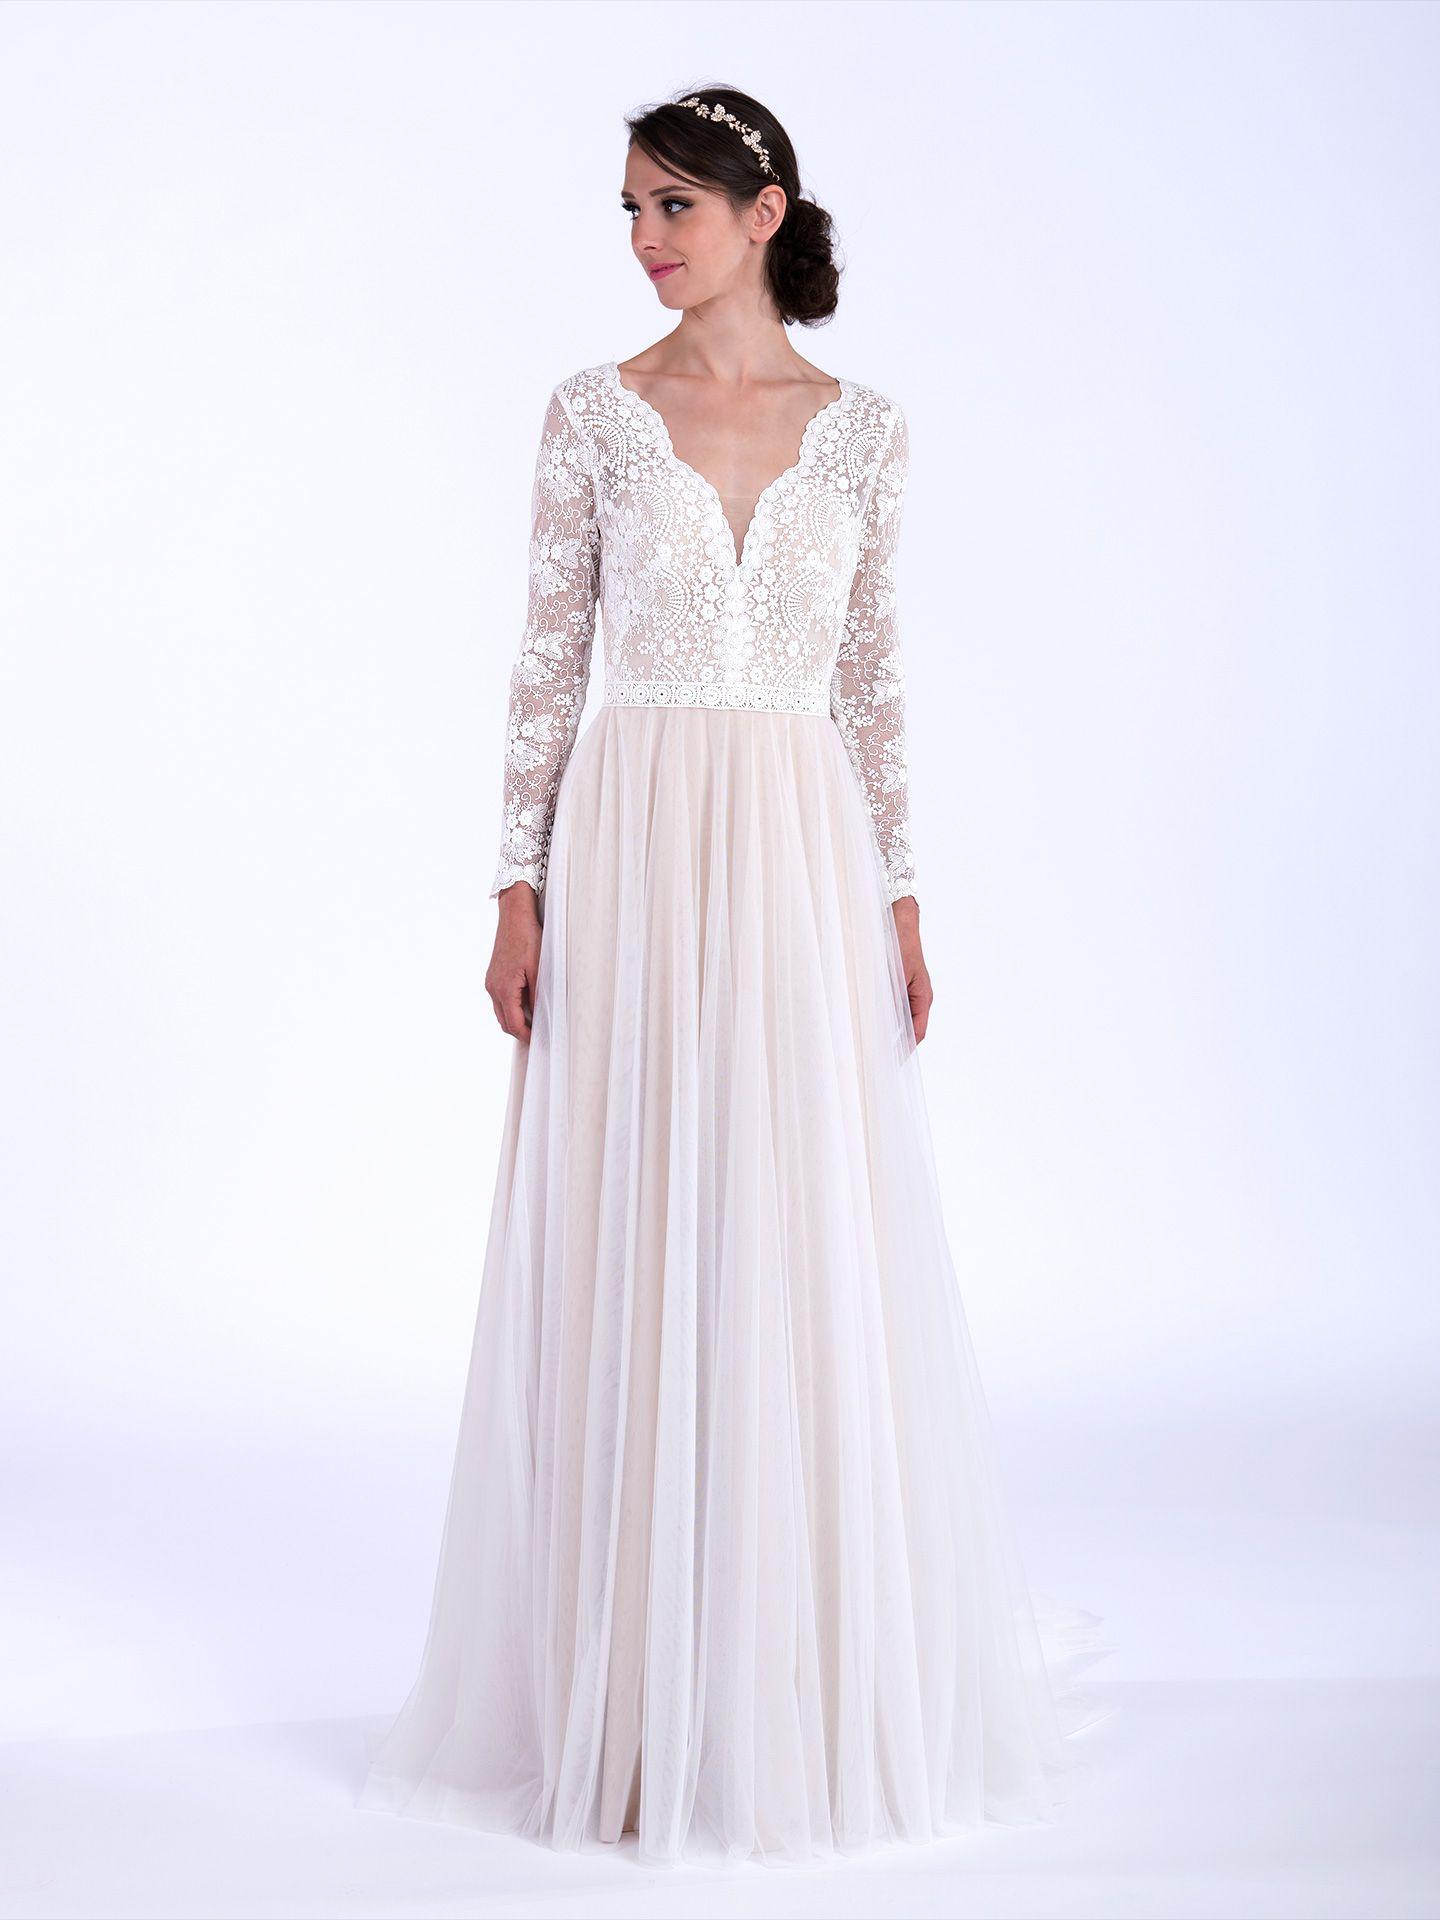 Boho wedding dress with long sleeves 5006 long sleeve